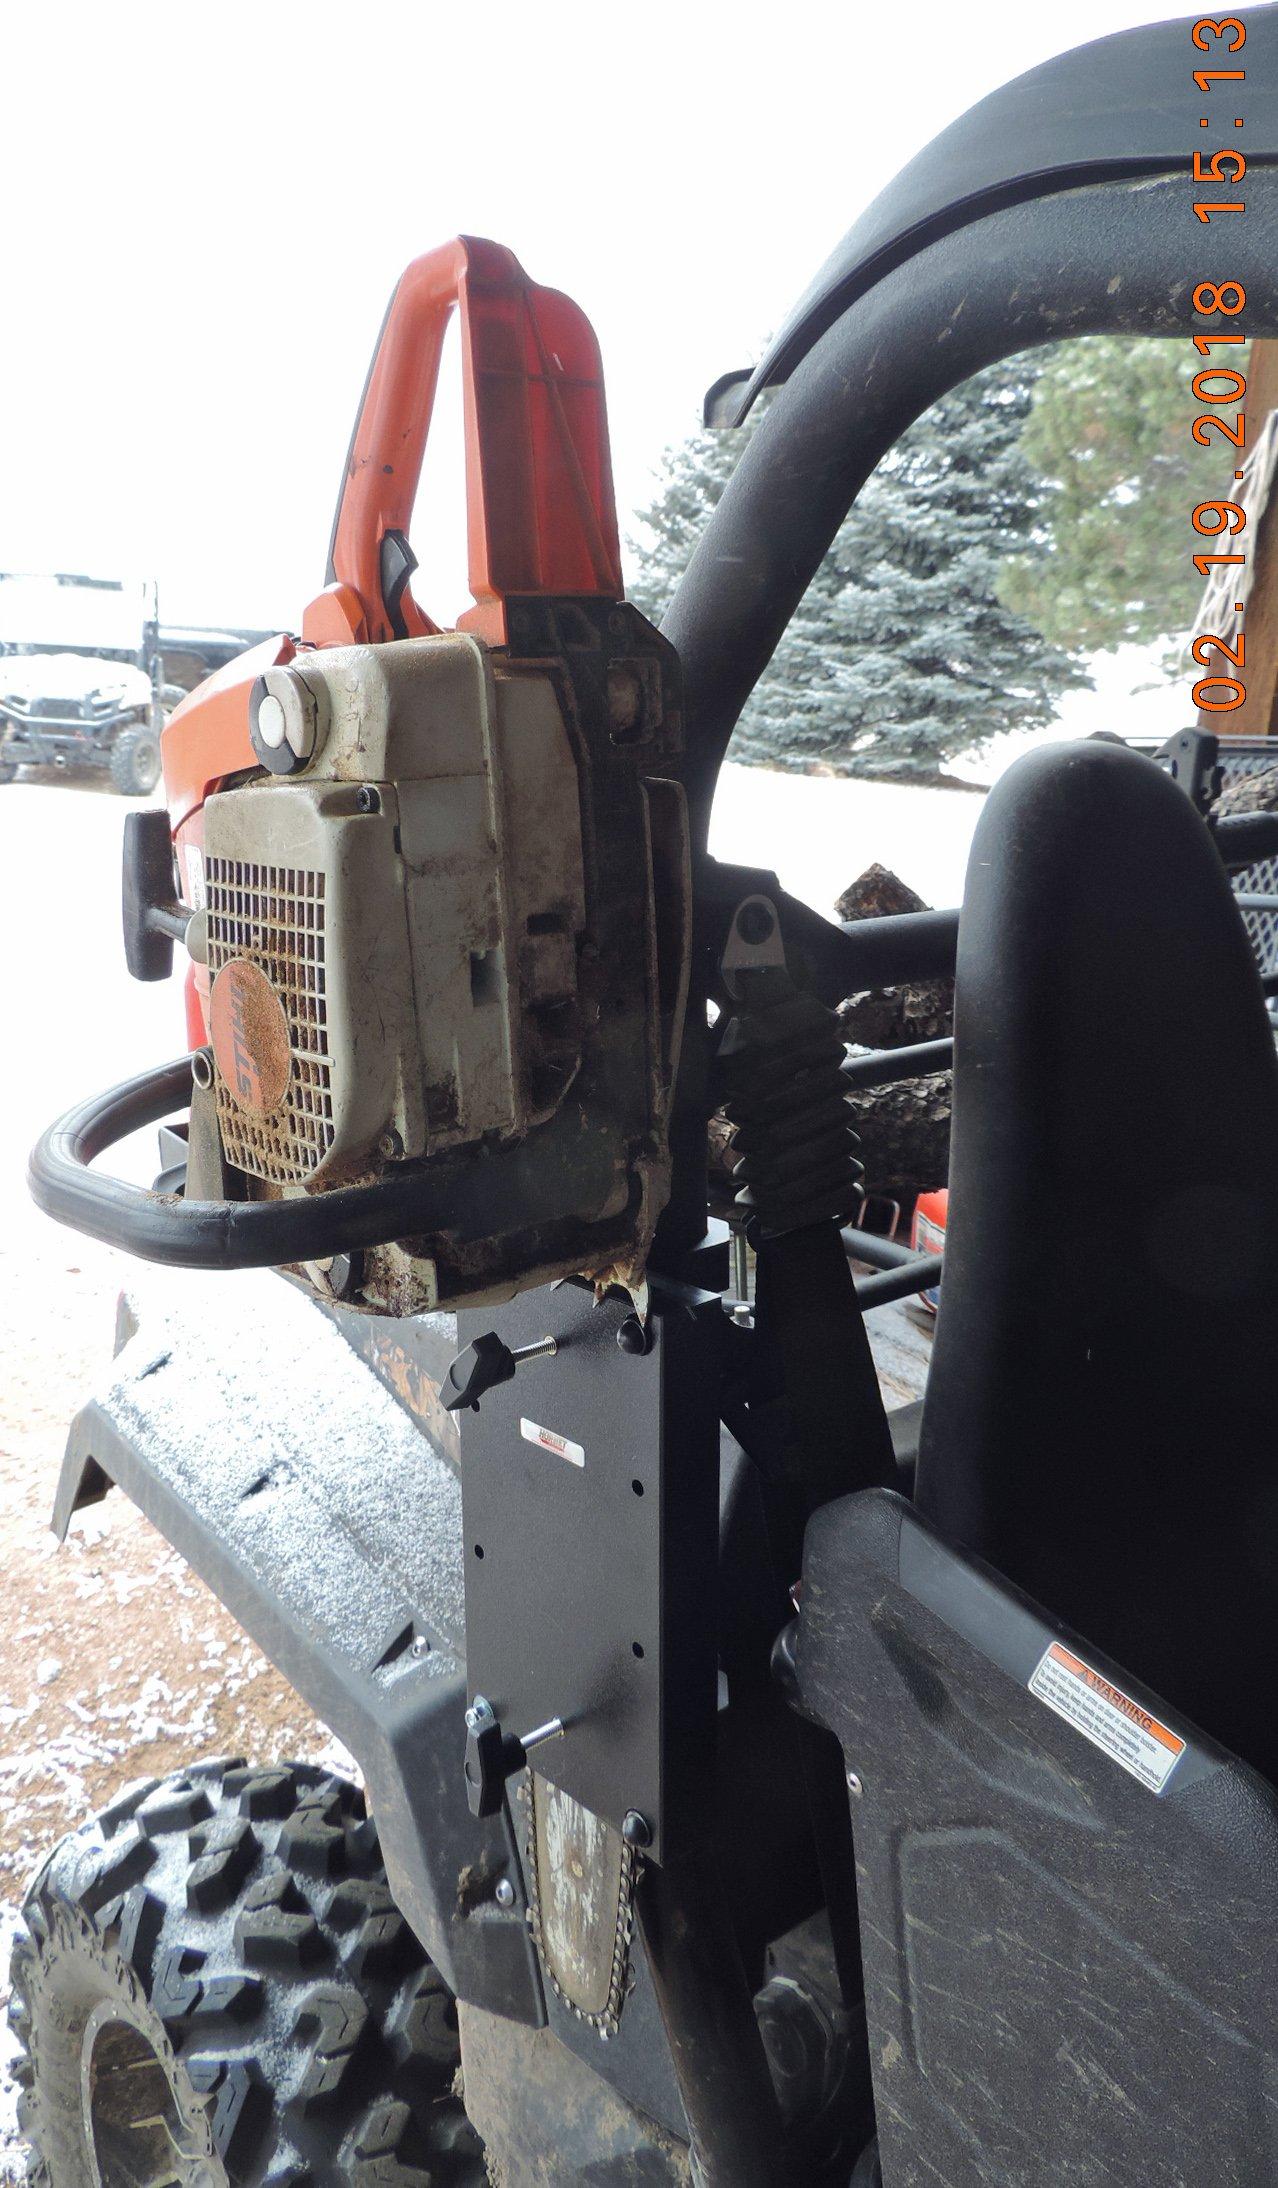 John Deere Gator Roll Bar Chainsaw Mount RCM-3012 by Hornet Outdoors (Image #2)